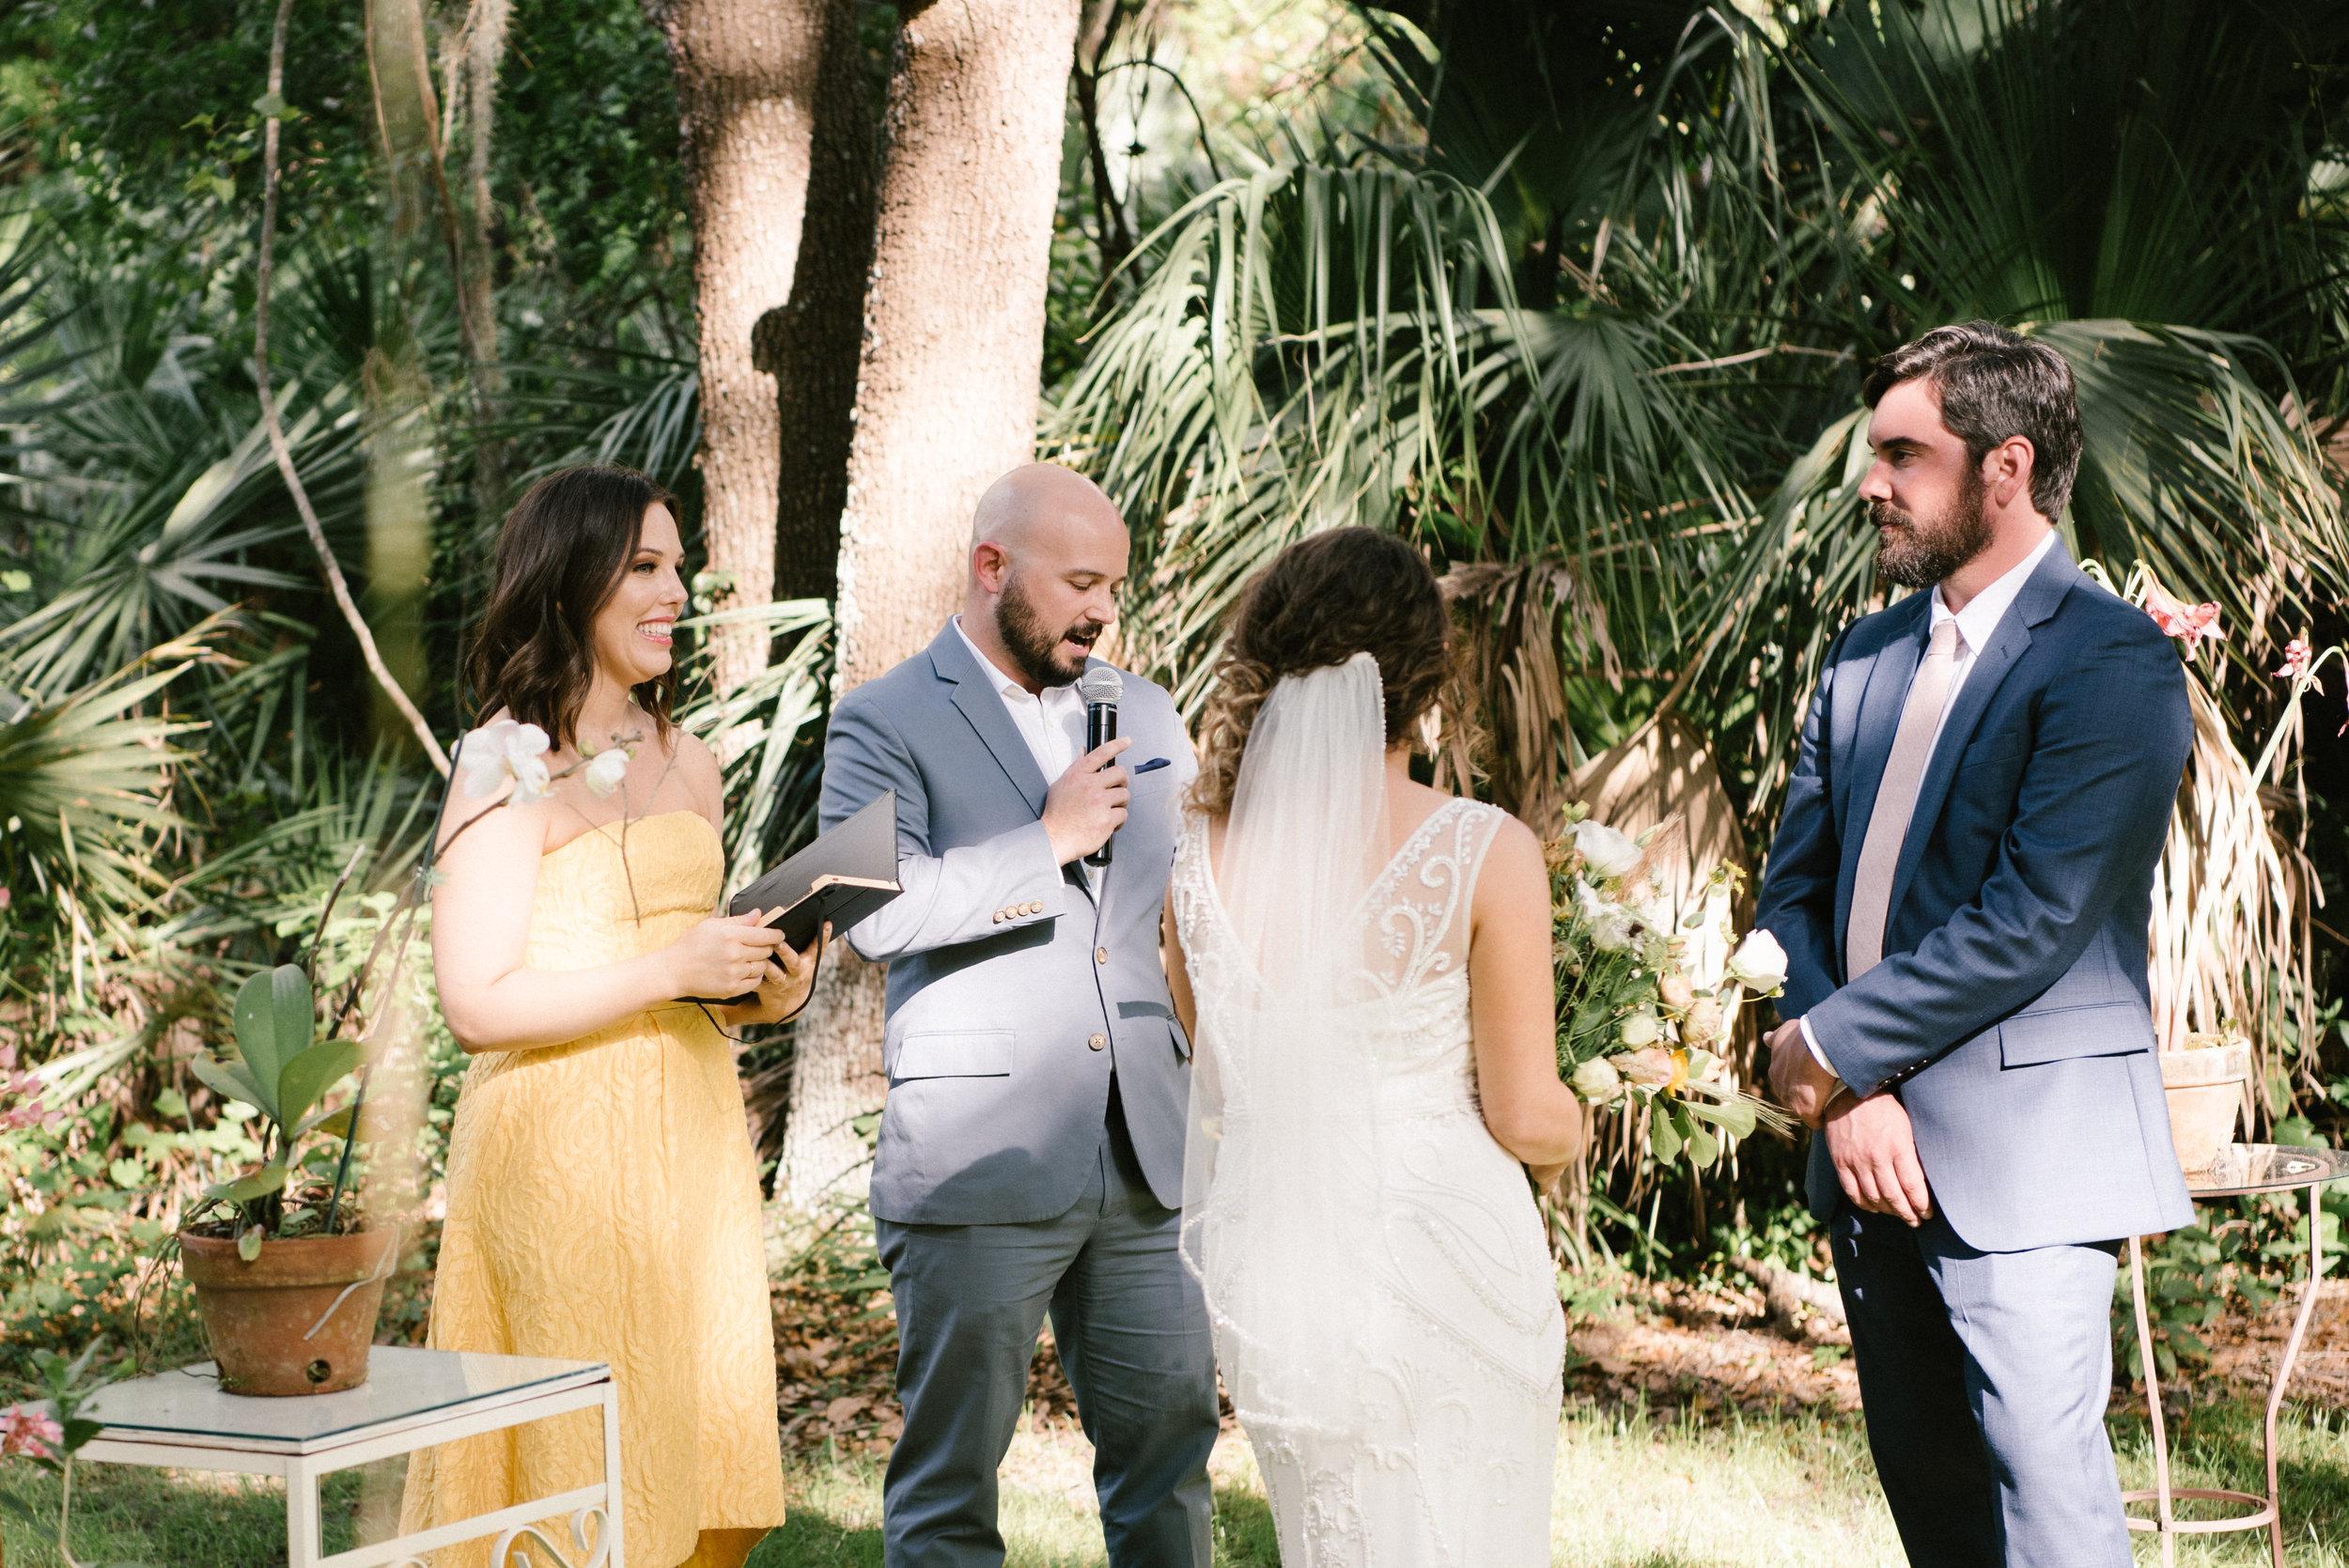 mclaughlin-wedding-461.jpg